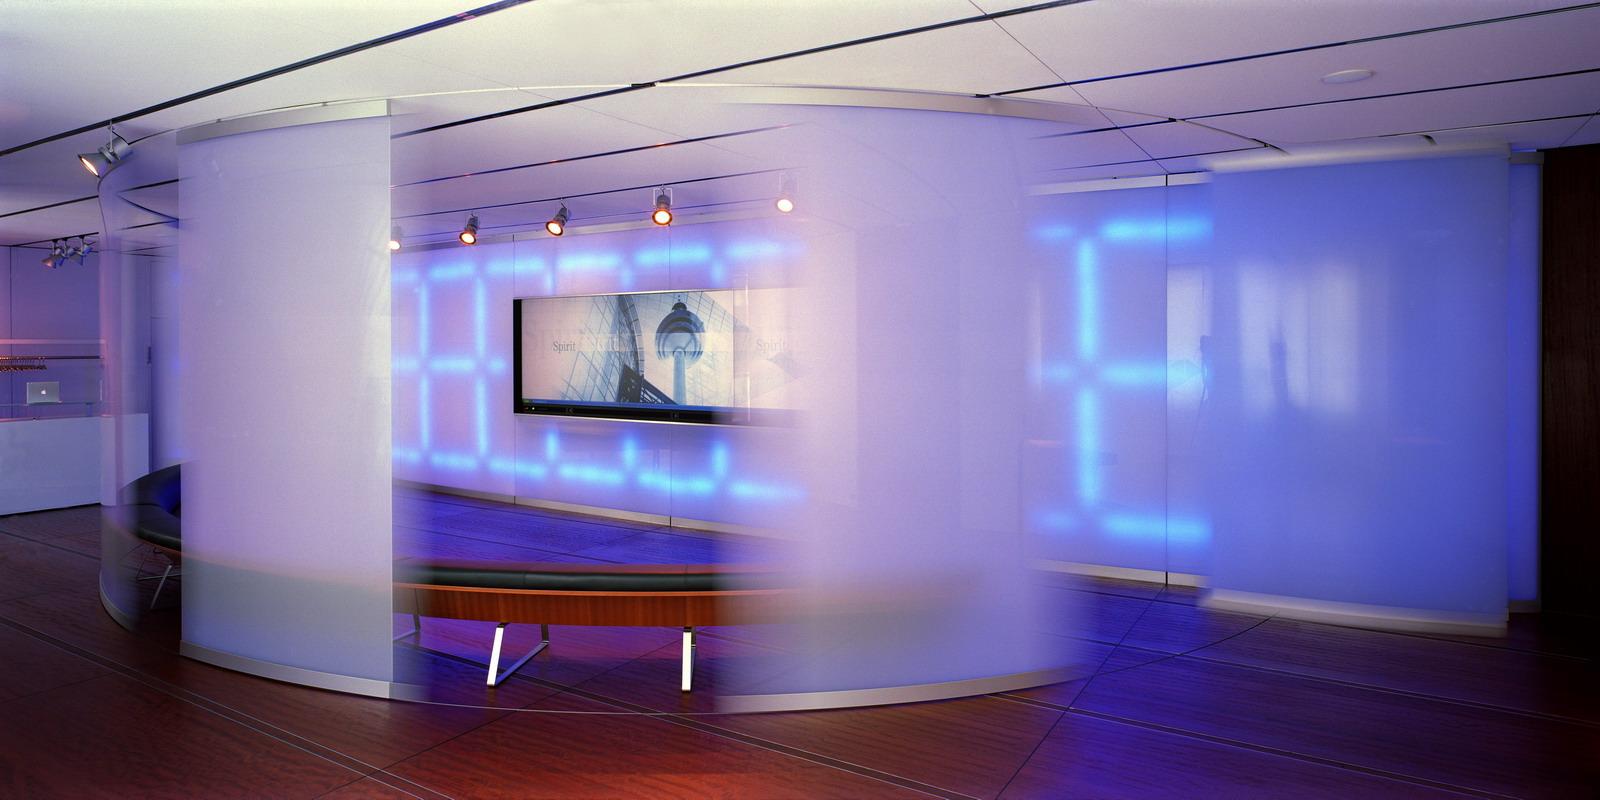 T systems interior design briefing center inmc for Interior design frankfurt